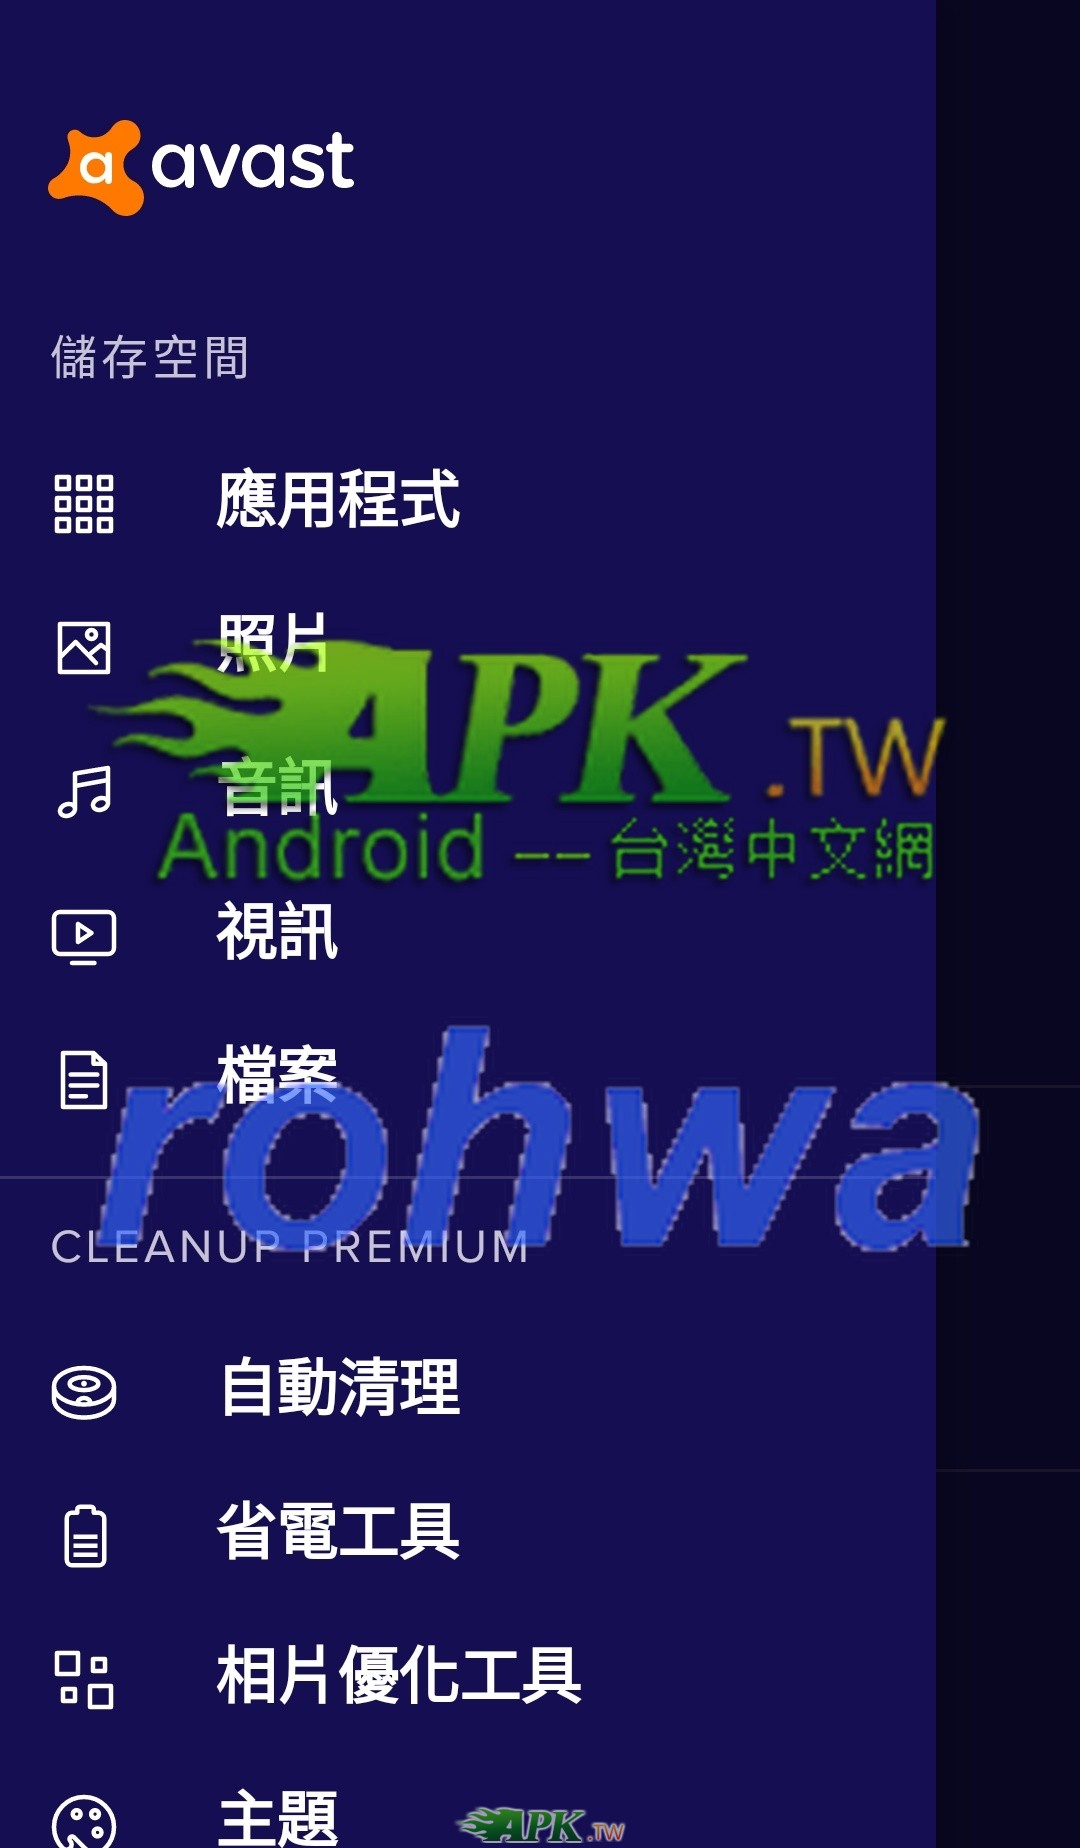 Avast_Cleanup__2_.jpg